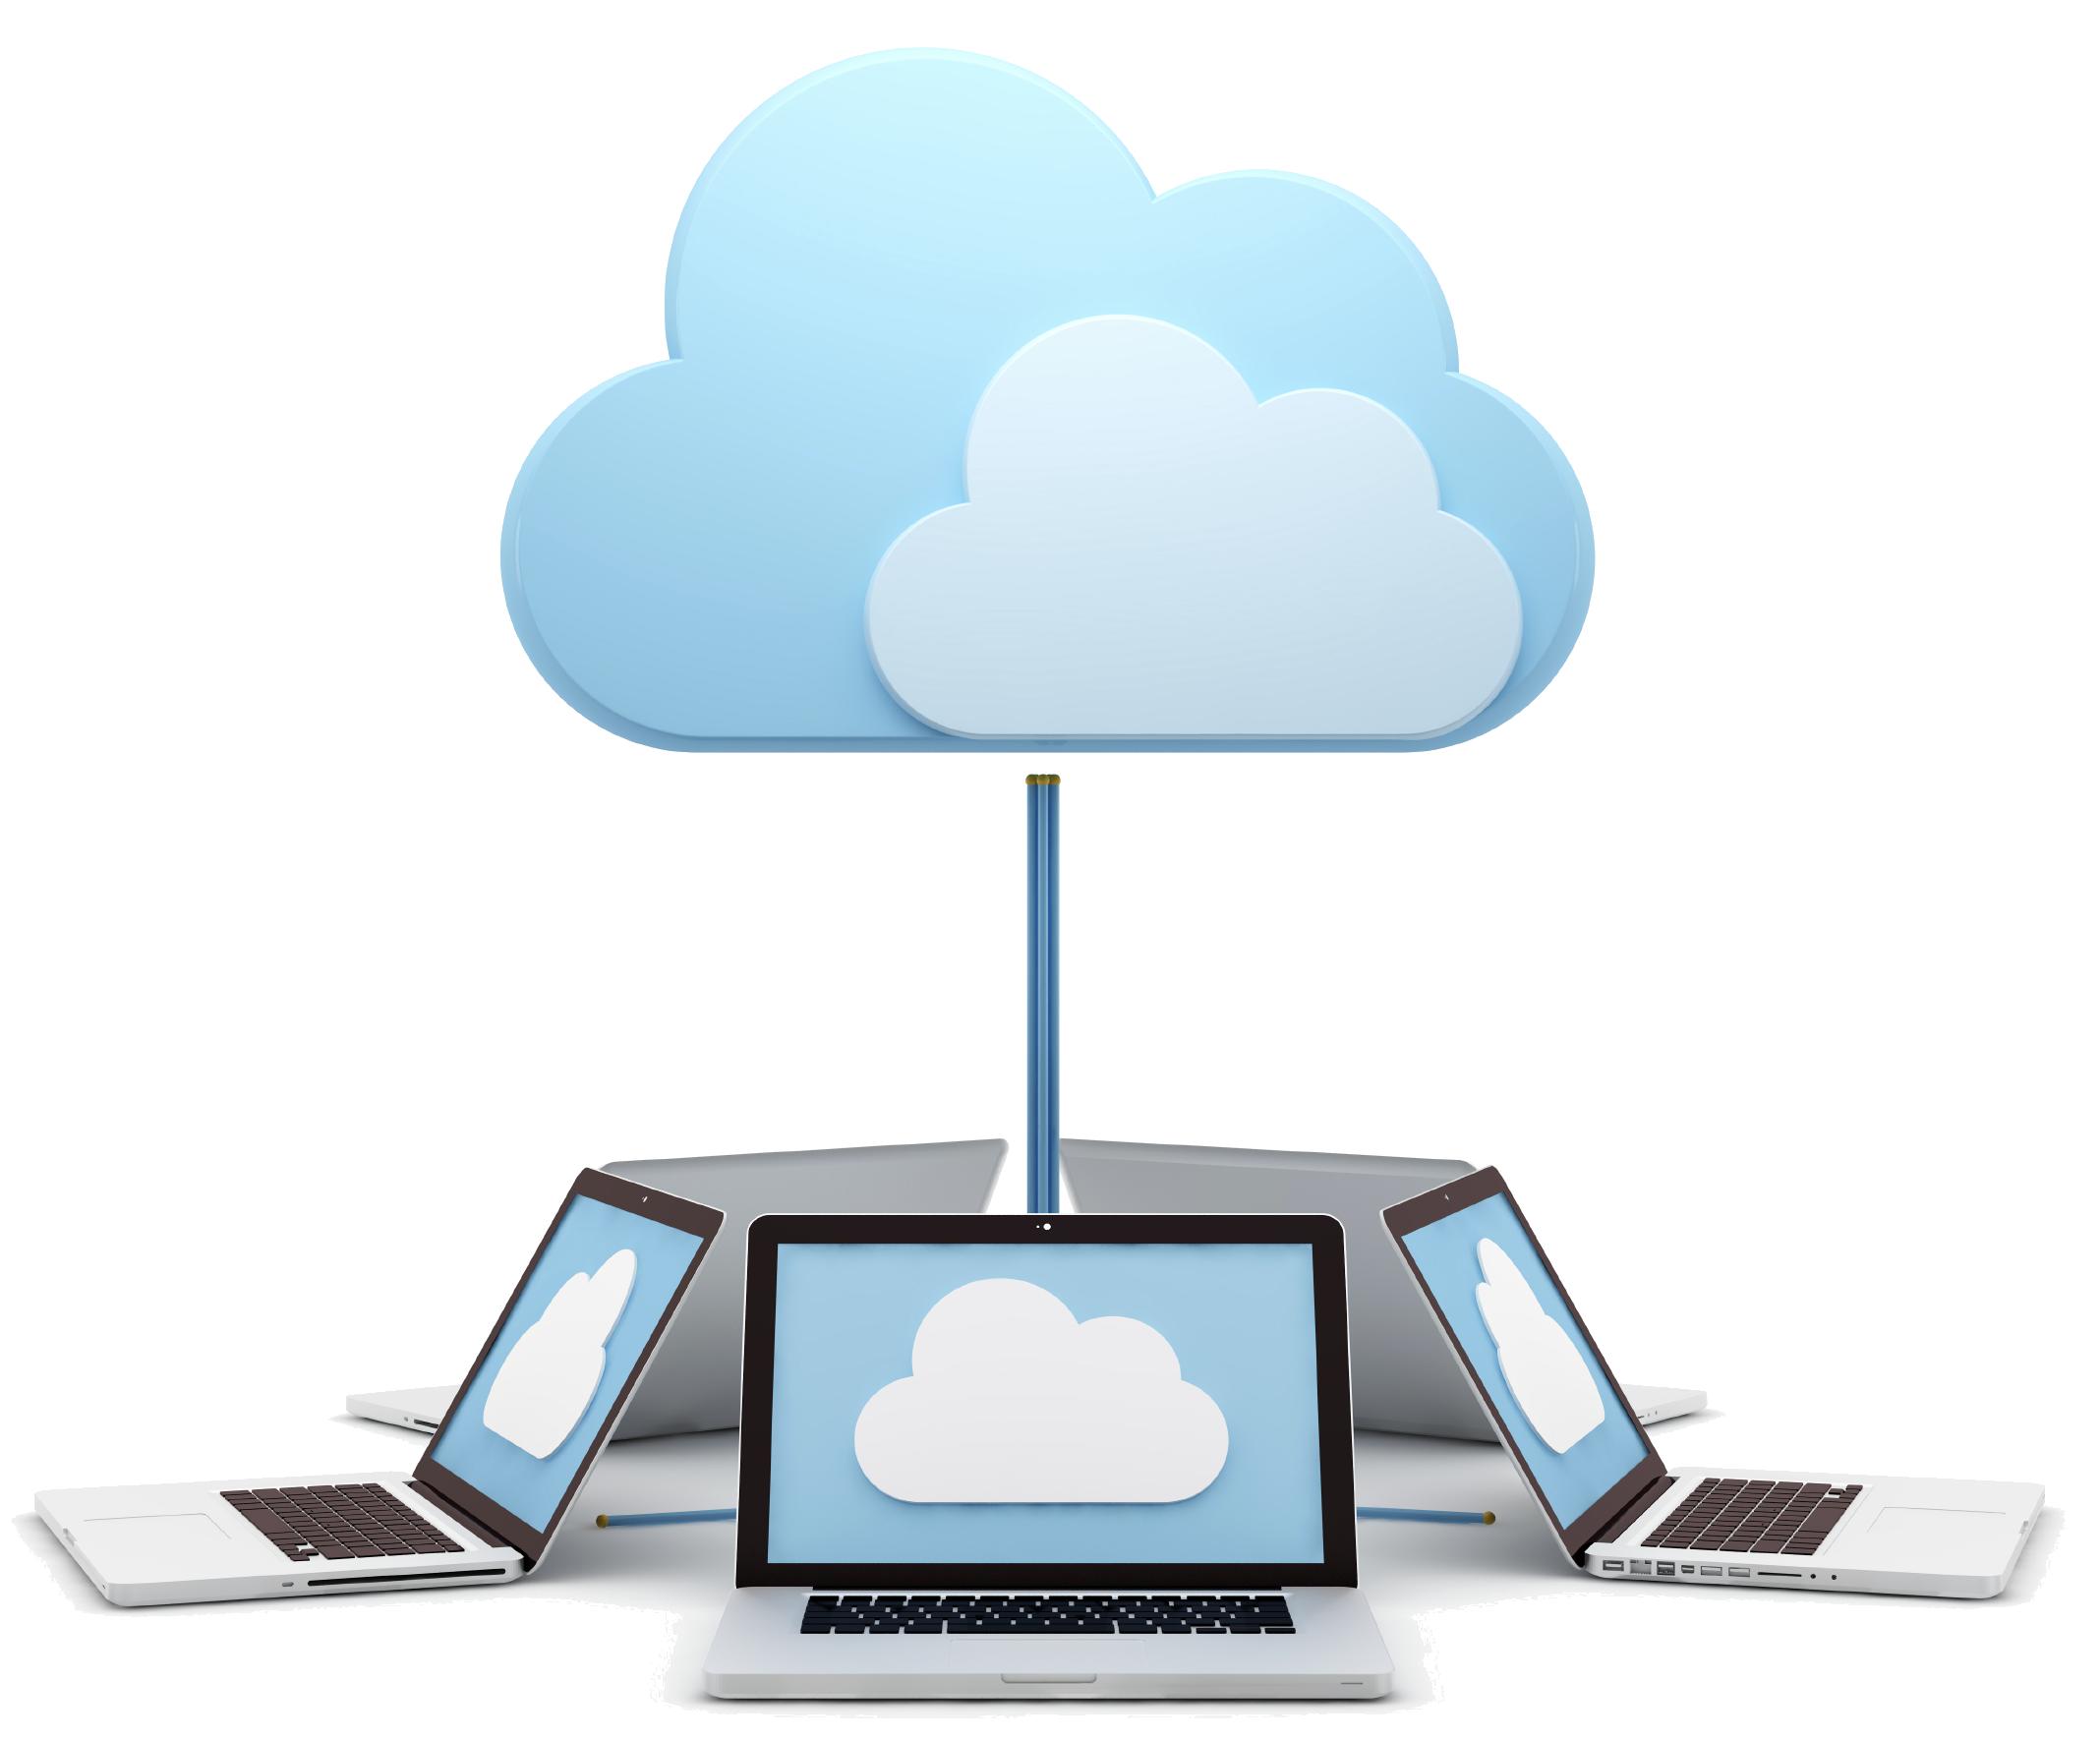 Icon - Desktop as a service